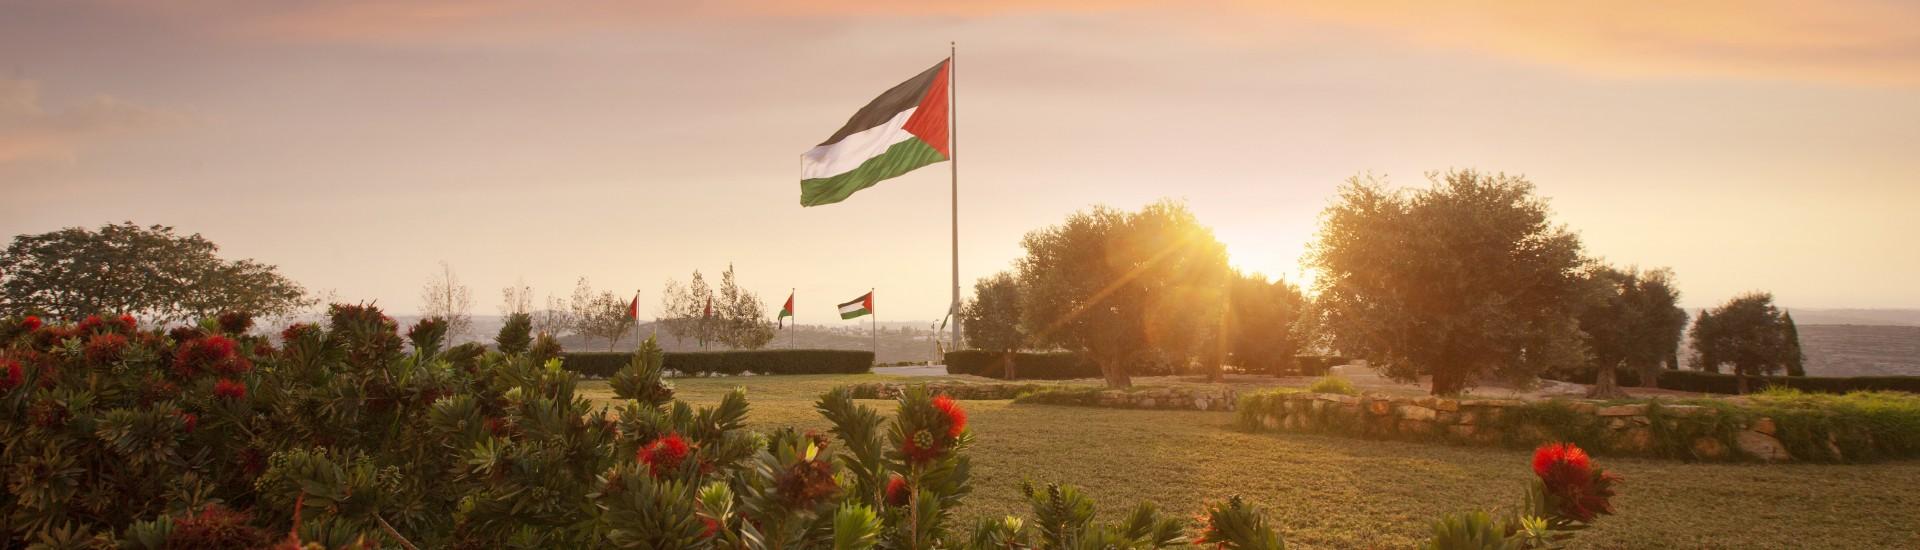 Why Palestine?